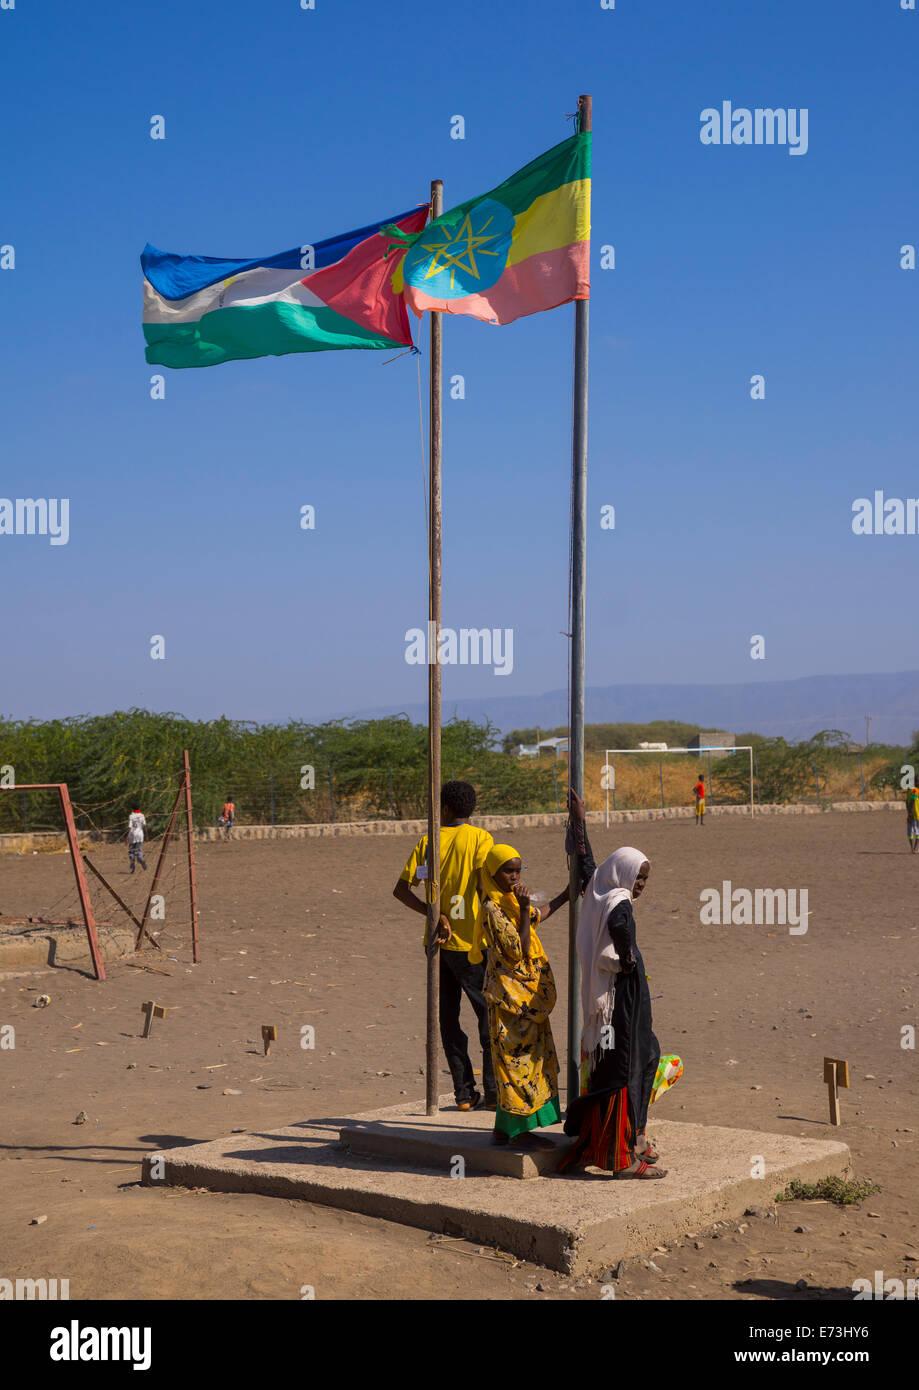 Afar And Ethiopian Flags In Kebir Tobolo School, Afambo, Afar Region, Ethiopia - Stock Image